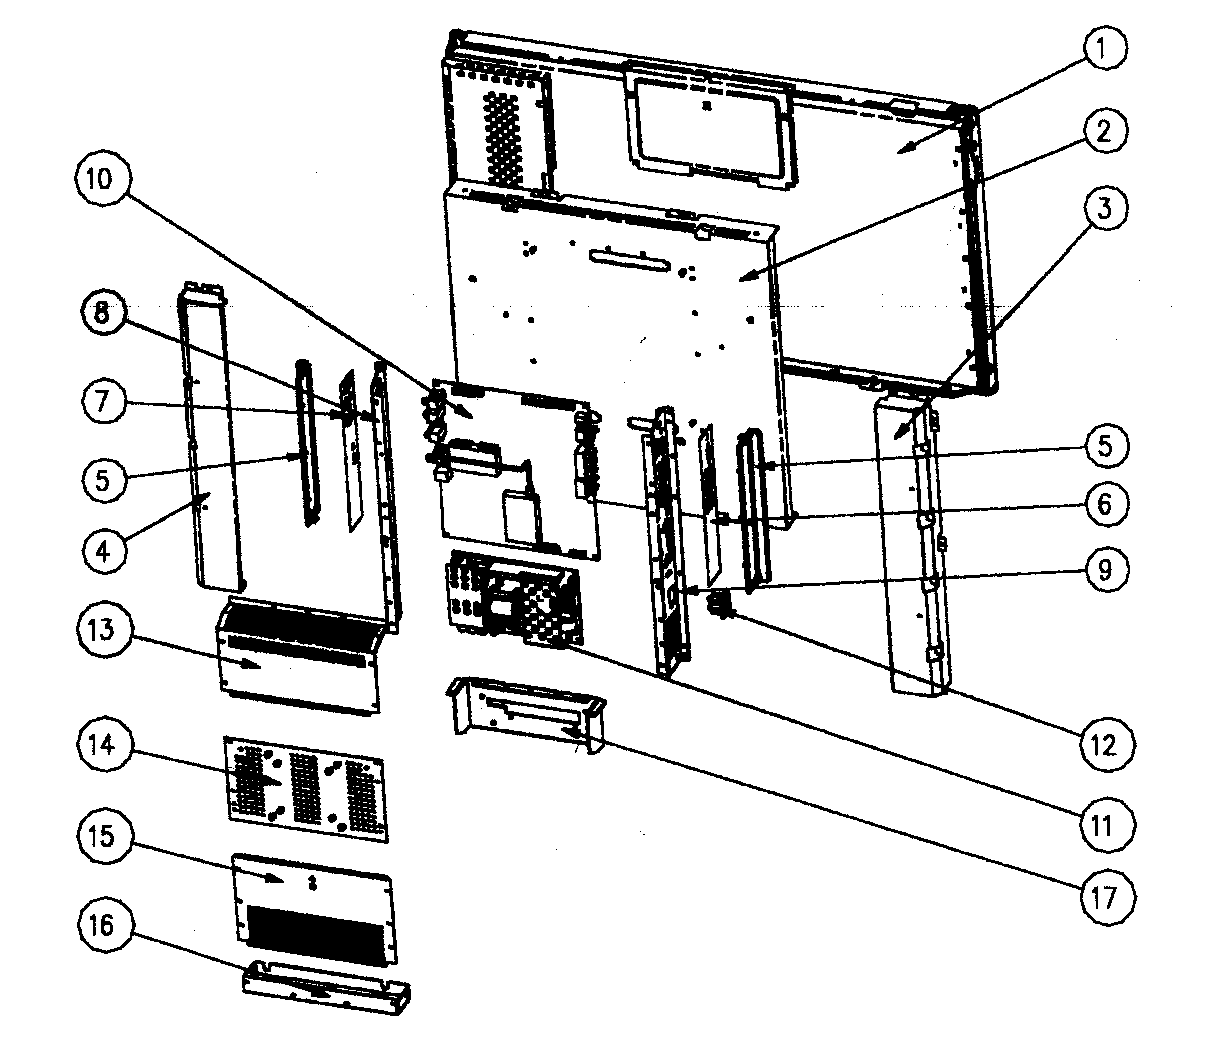 BASE ASSY Diagram & Parts List for Model LTV32W4HDC